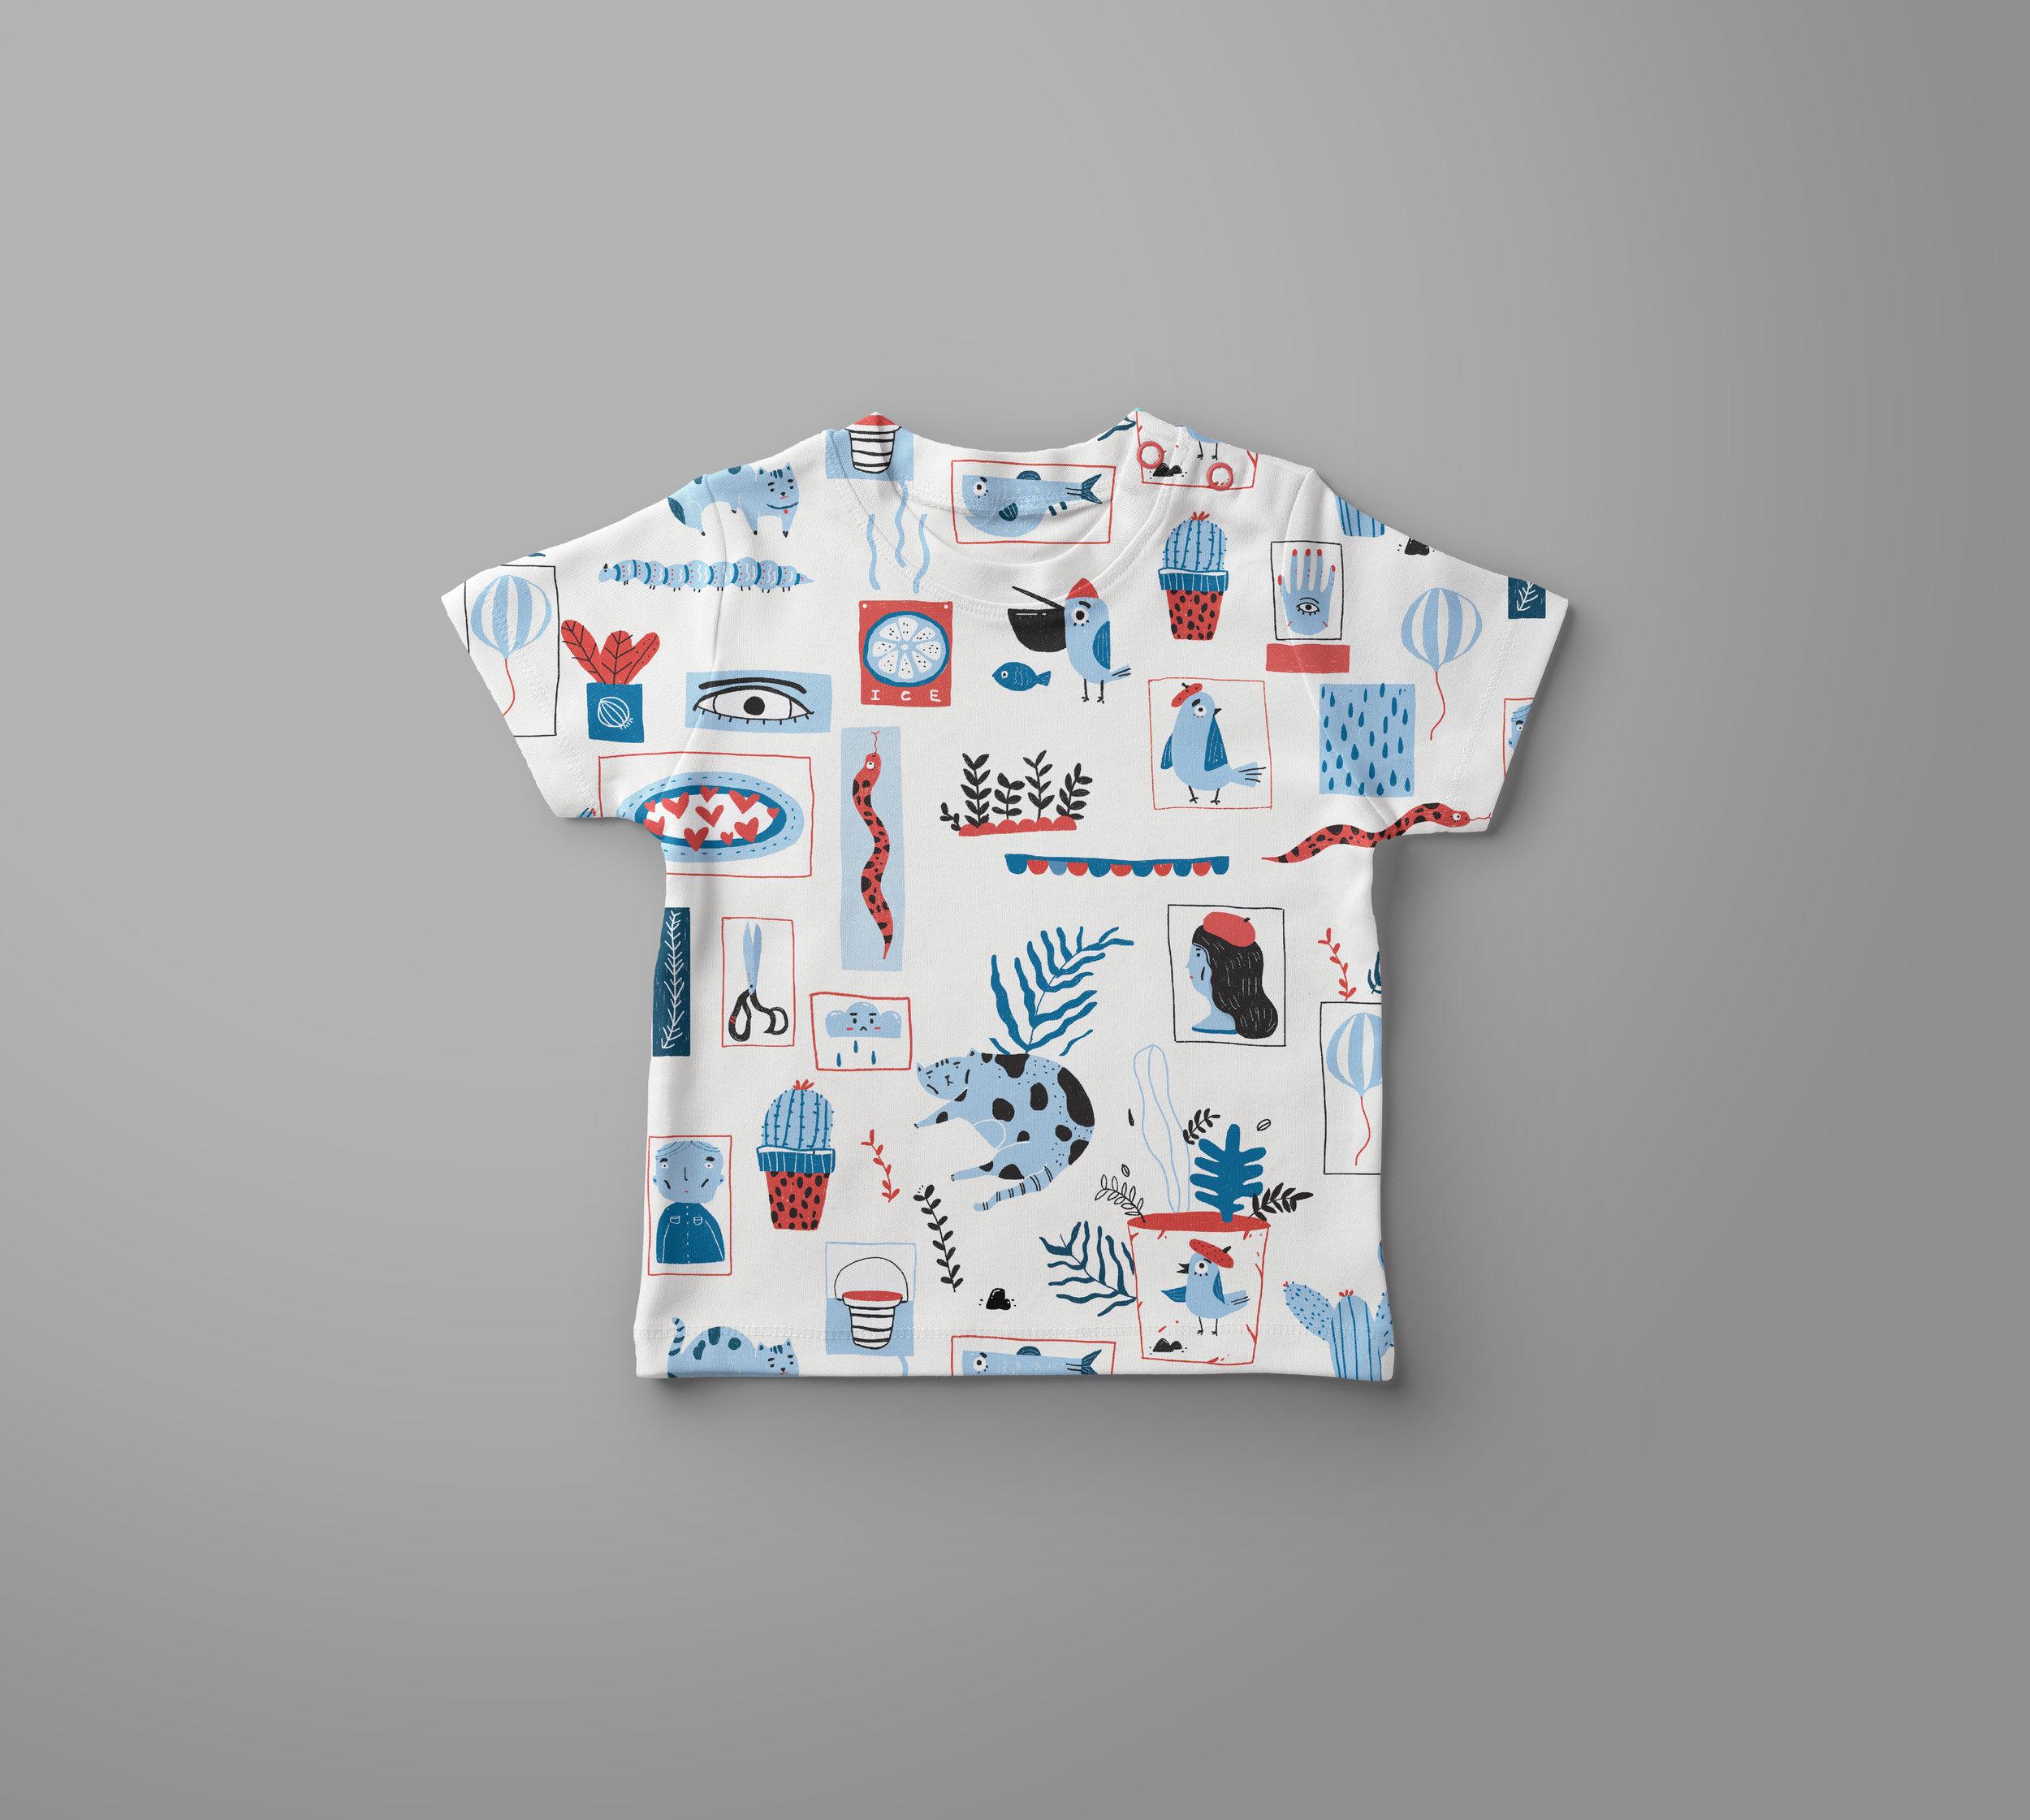 Baby-T-Shirt-Mockup.jpg